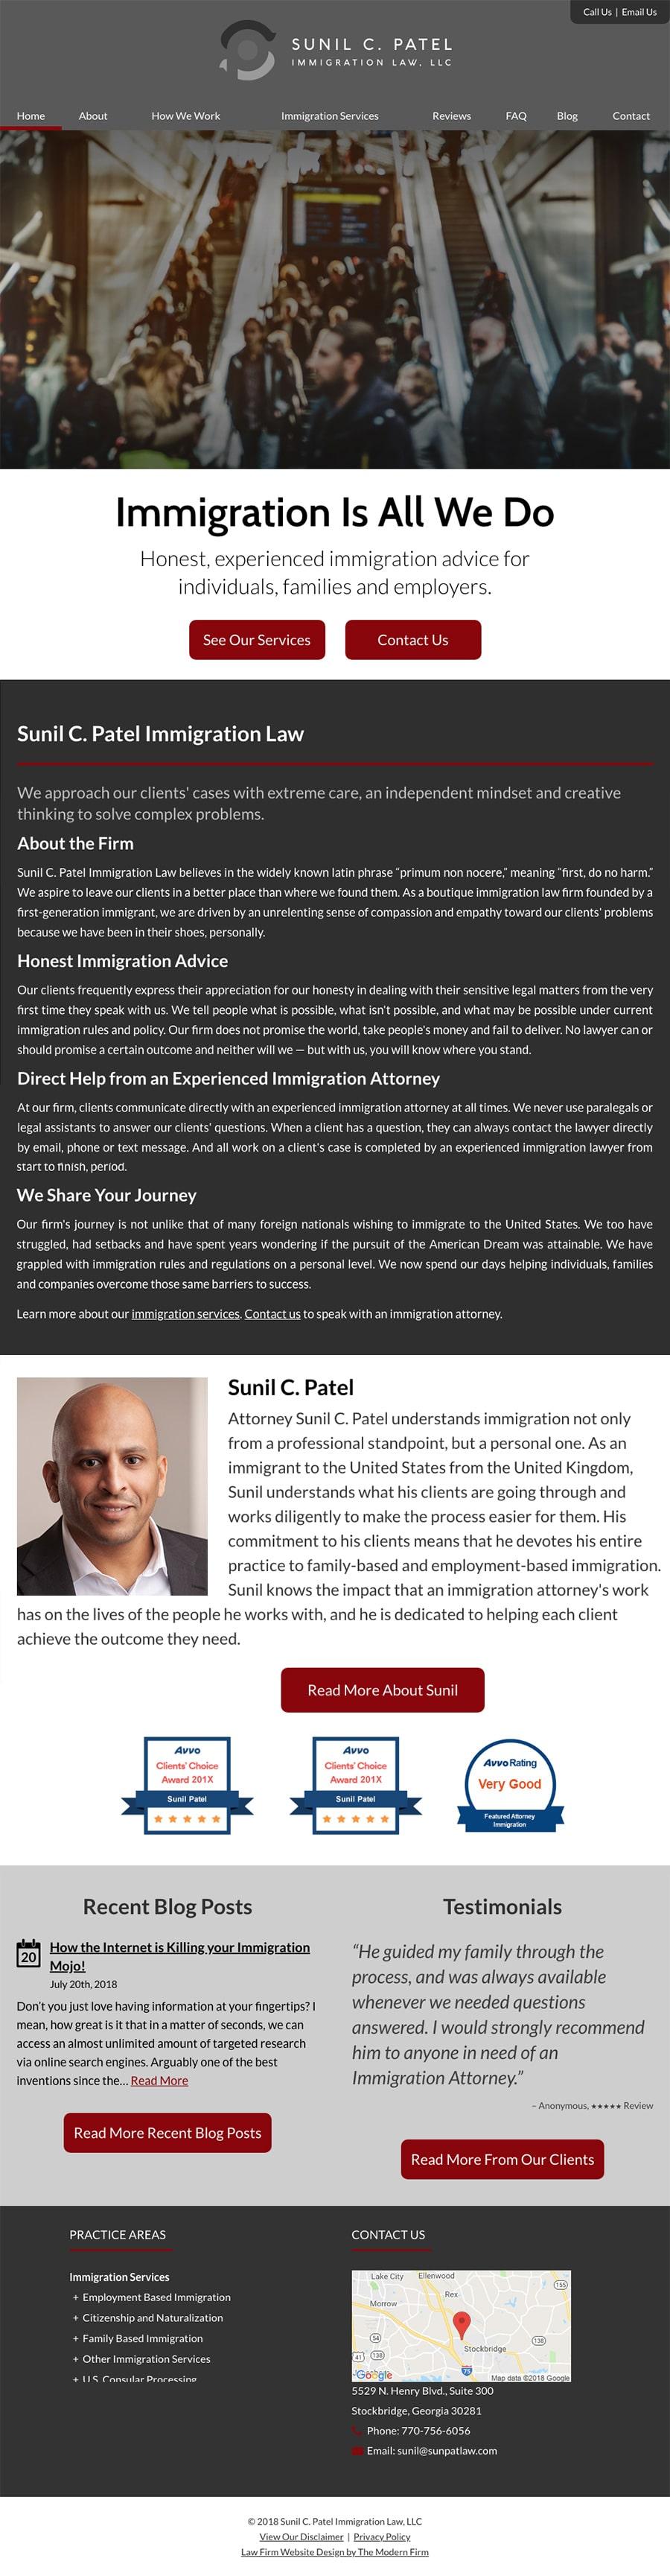 Law Firm Website Design for Sunil C. Patel Immigration Law, LLC